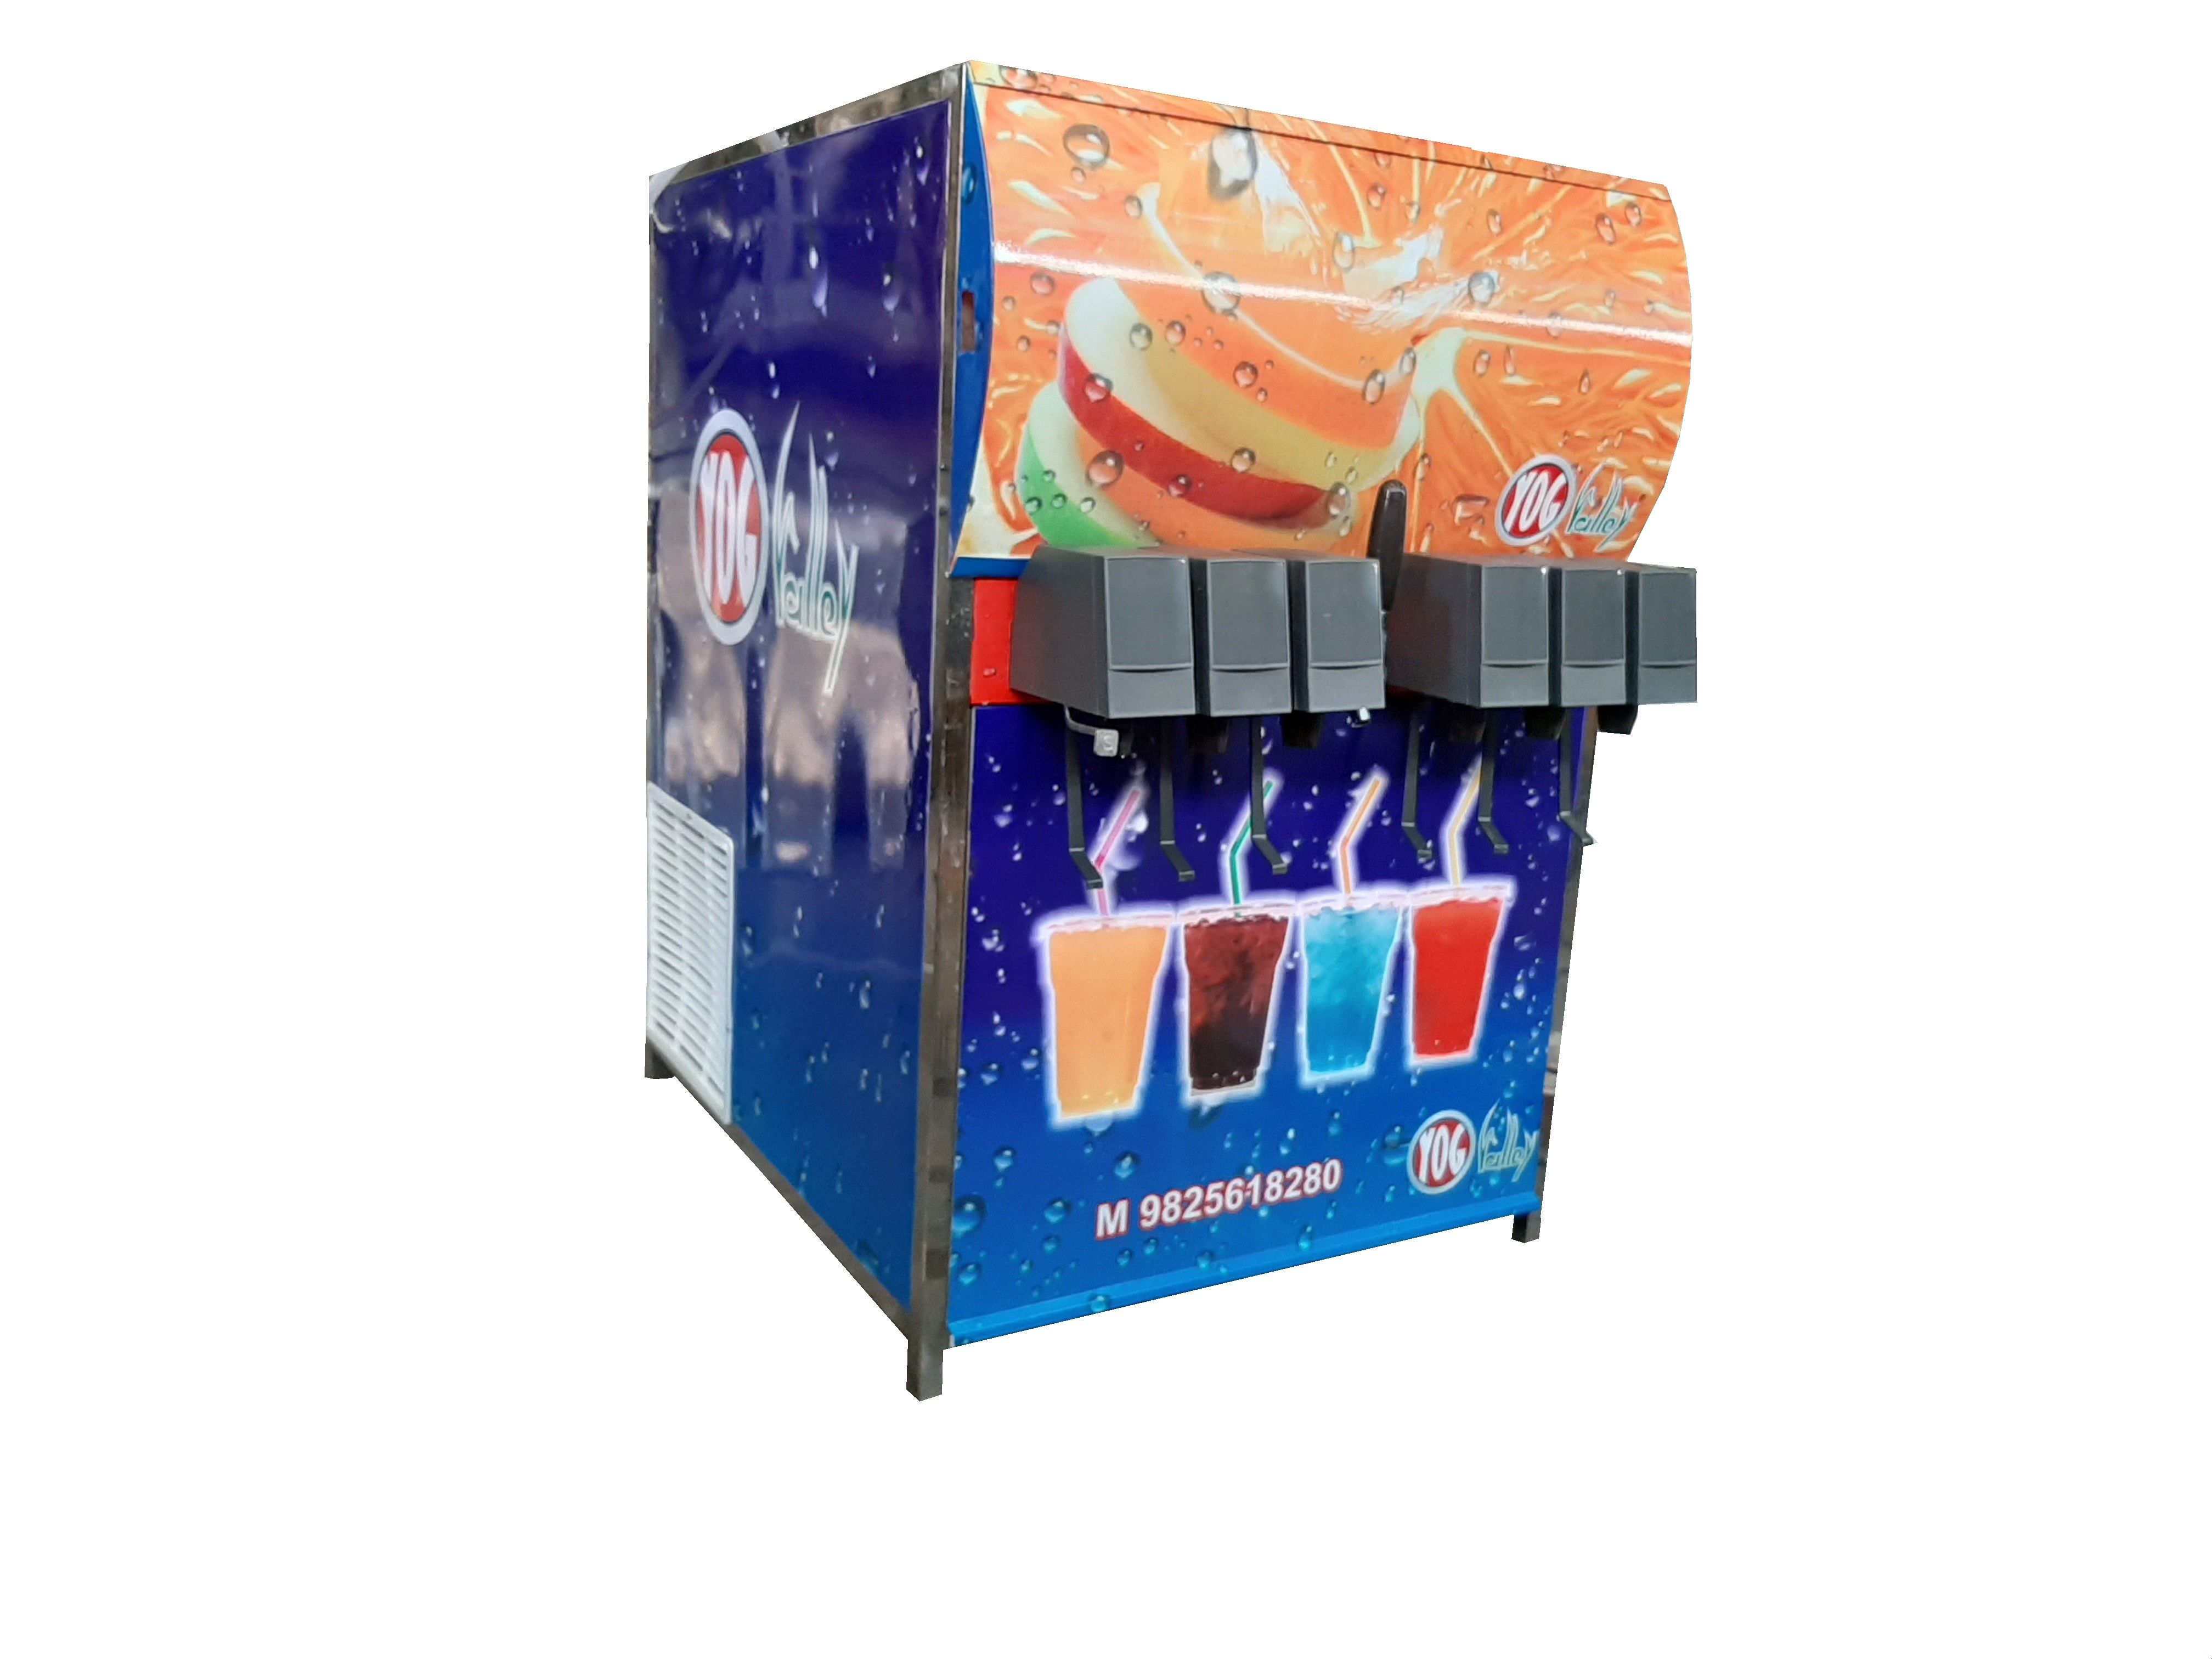 Soda Vending Machine